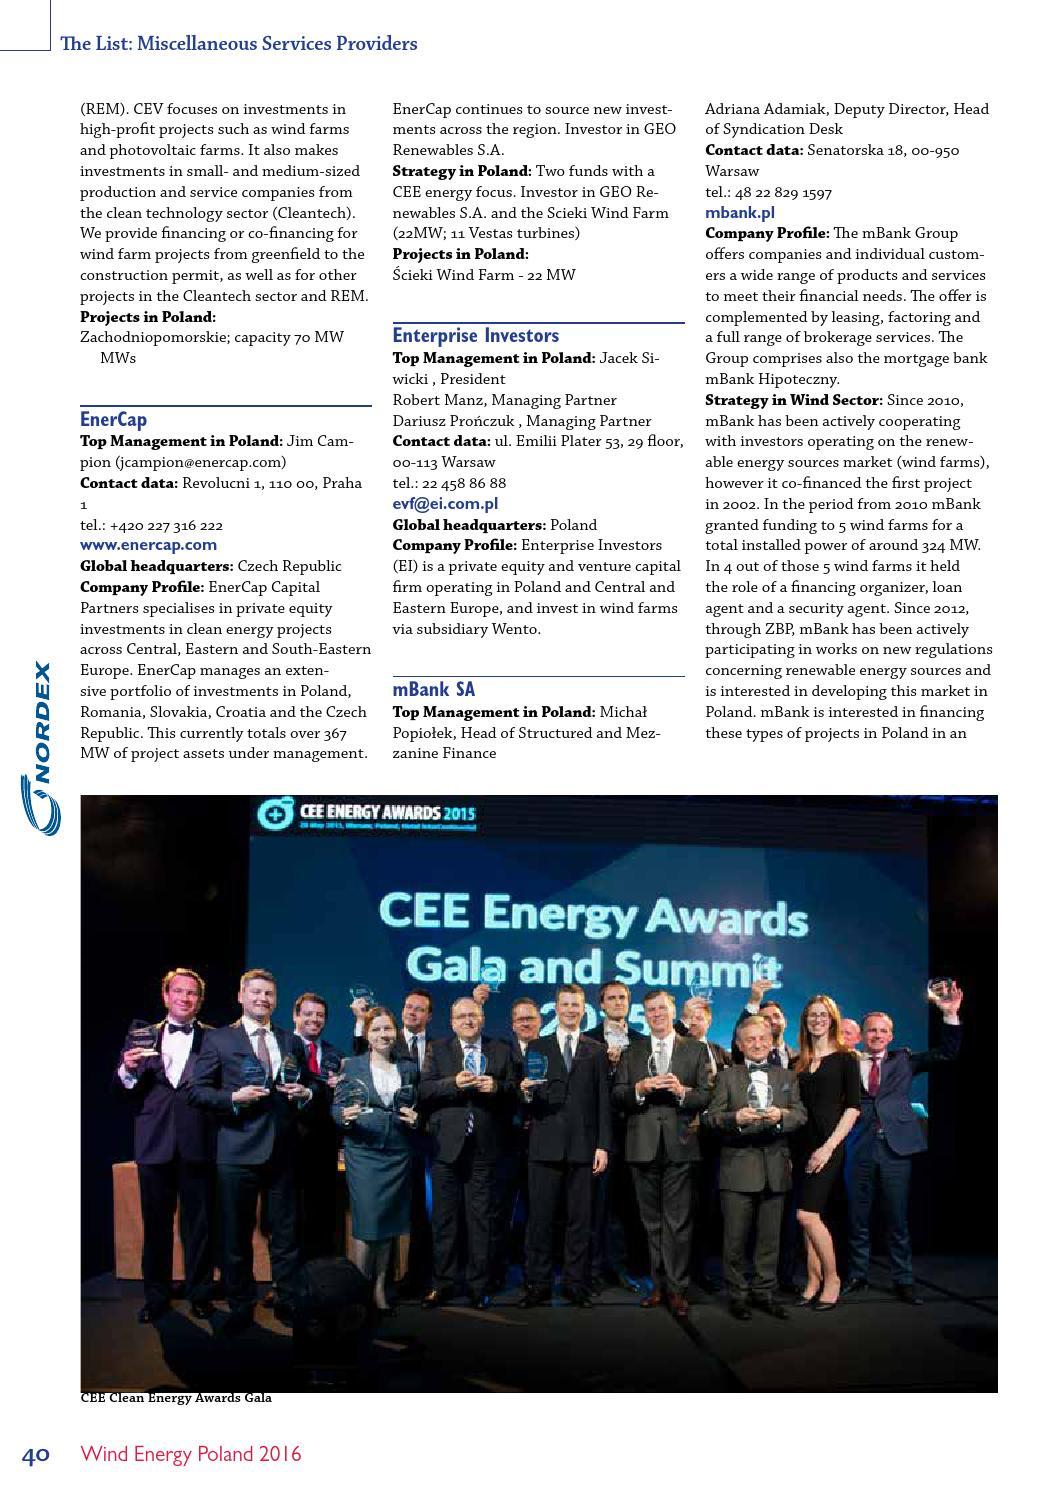 Wind Energy Poland - 2016 by BiznesPolska/CEE Business Media